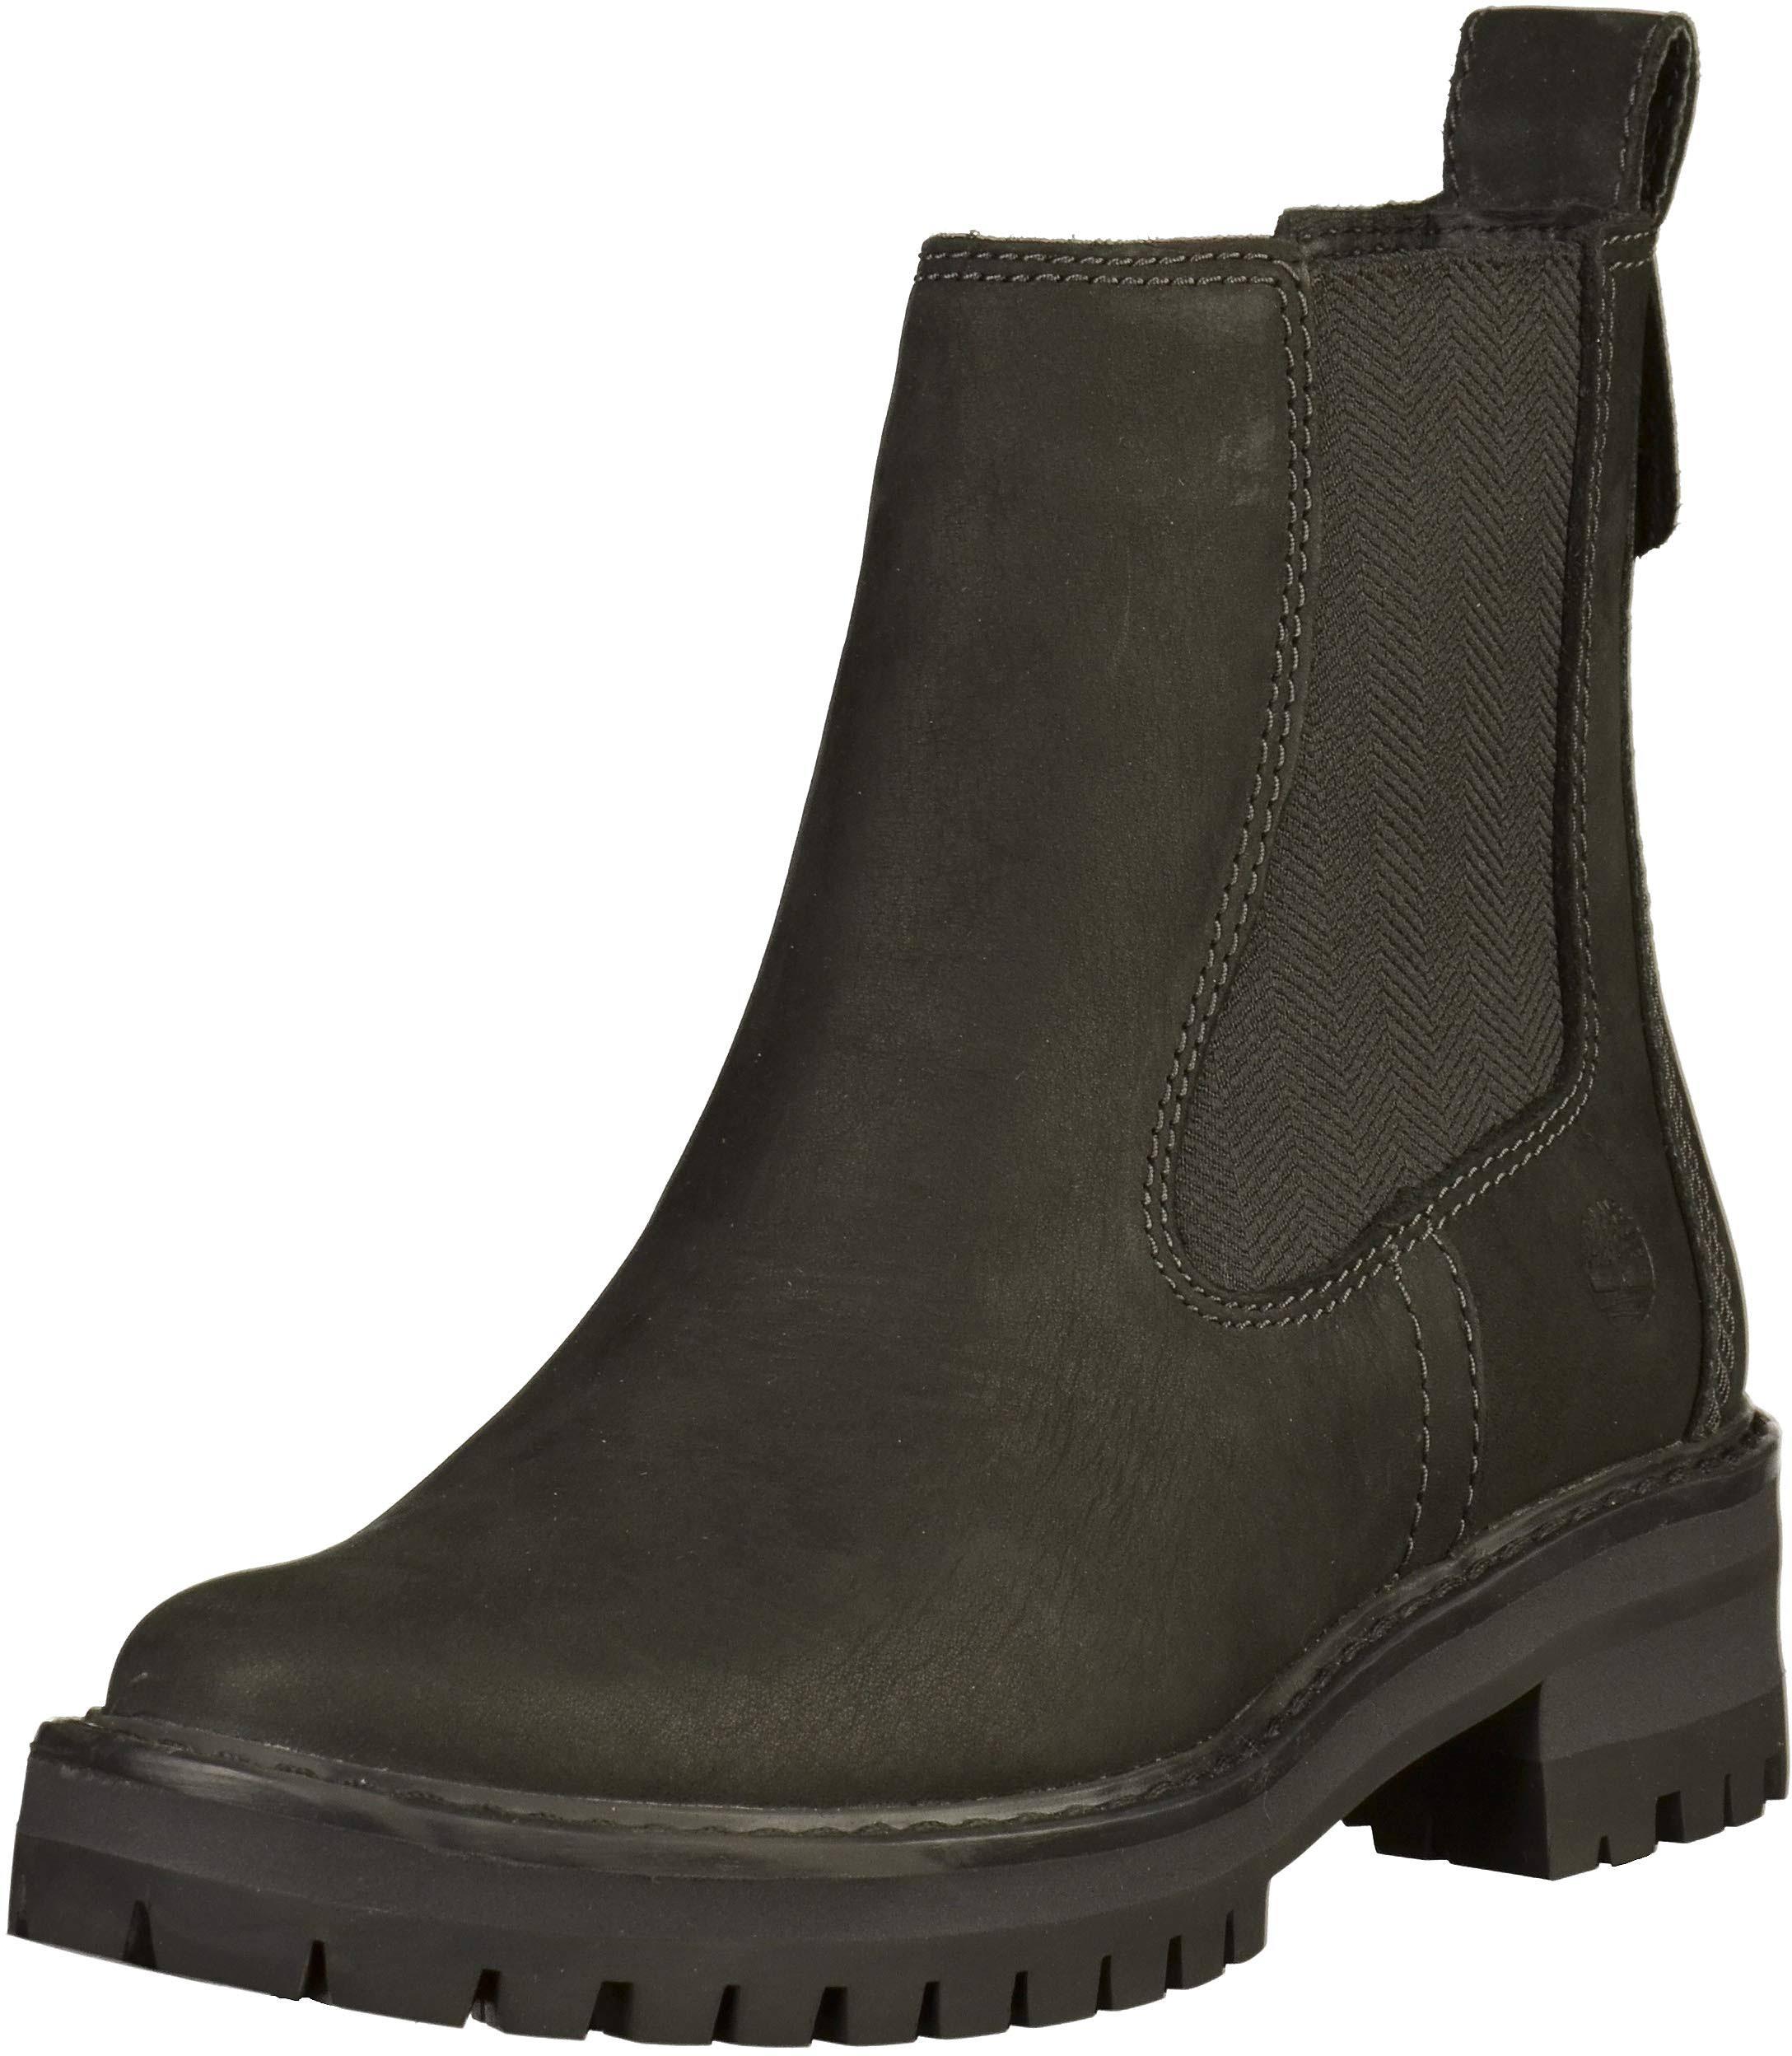 Us Rozmiar Boot Valley Earthybuck Color Grey Chelsea 10 Courmayeur Black Black Timberland Damskie Jet Trampki qT8BZ80n